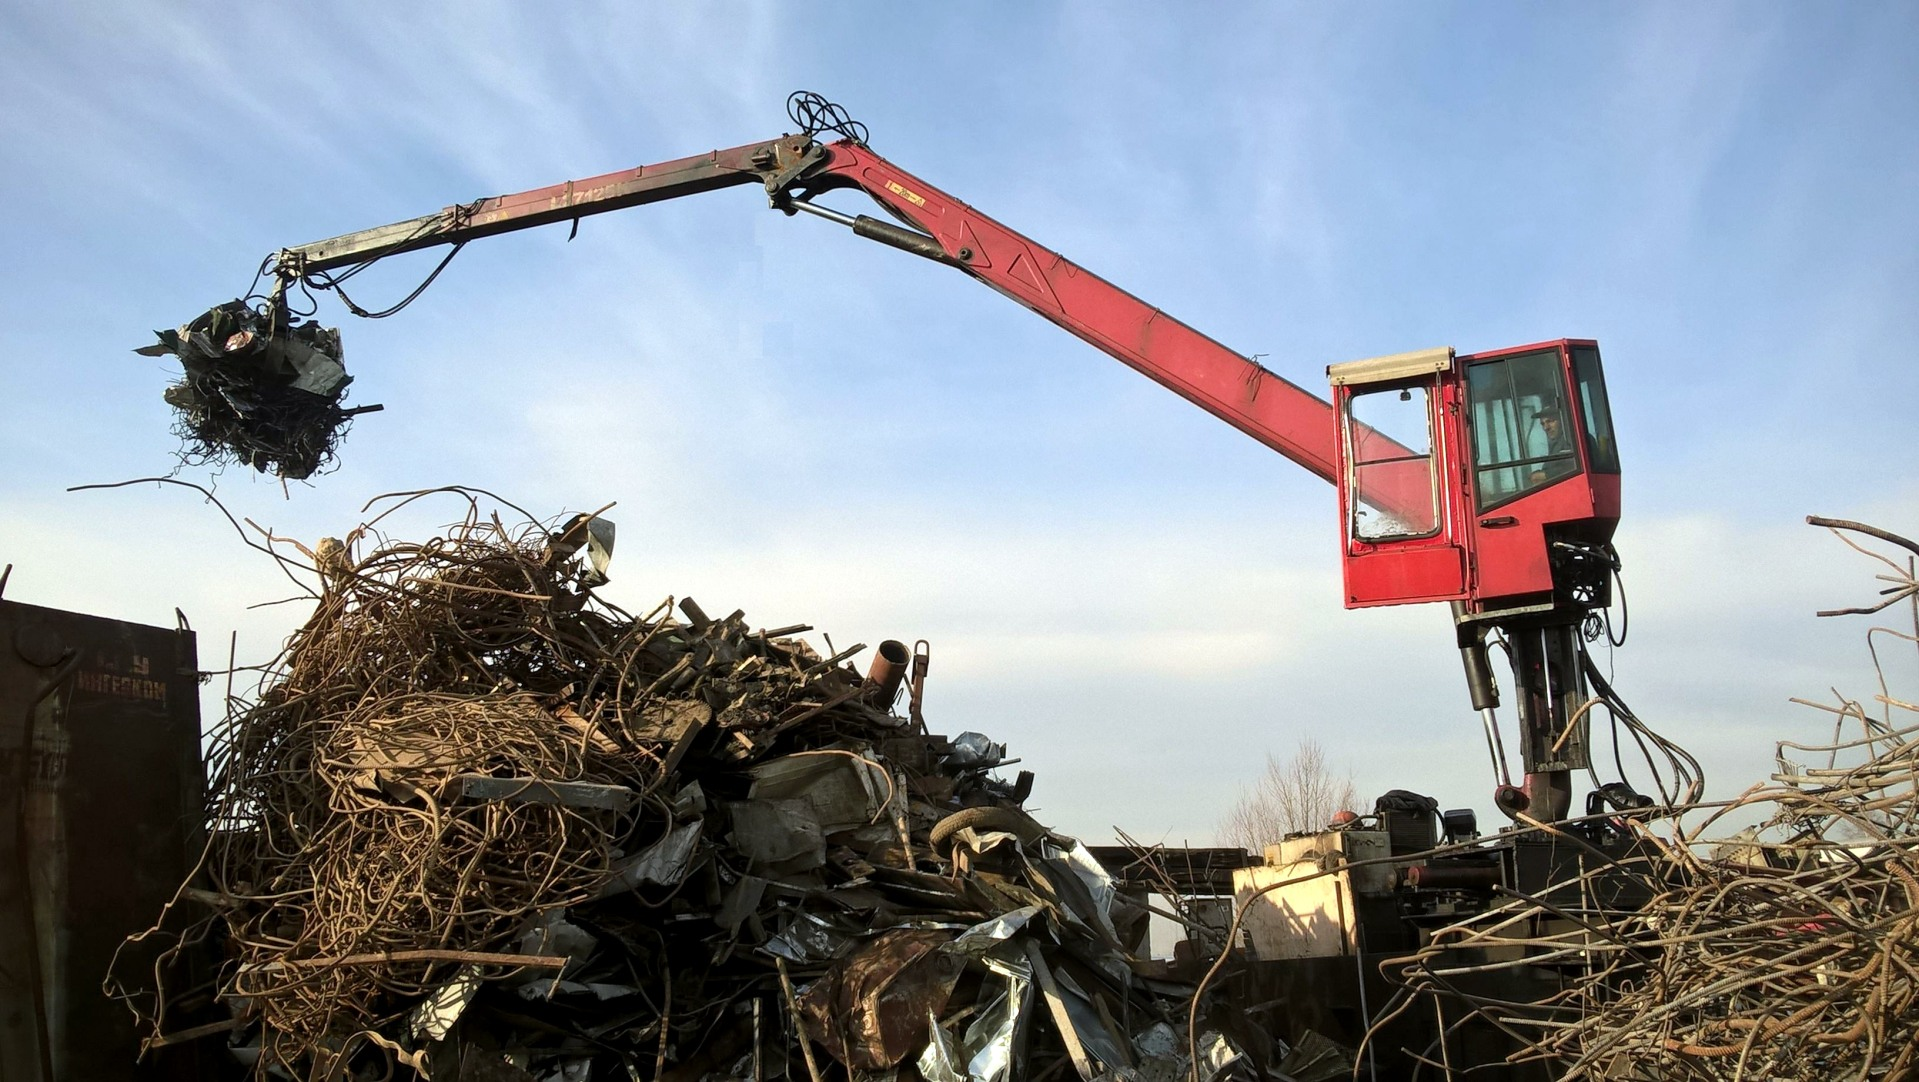 Цена за кг металлолома в Голицыно приемка металла в Муханово